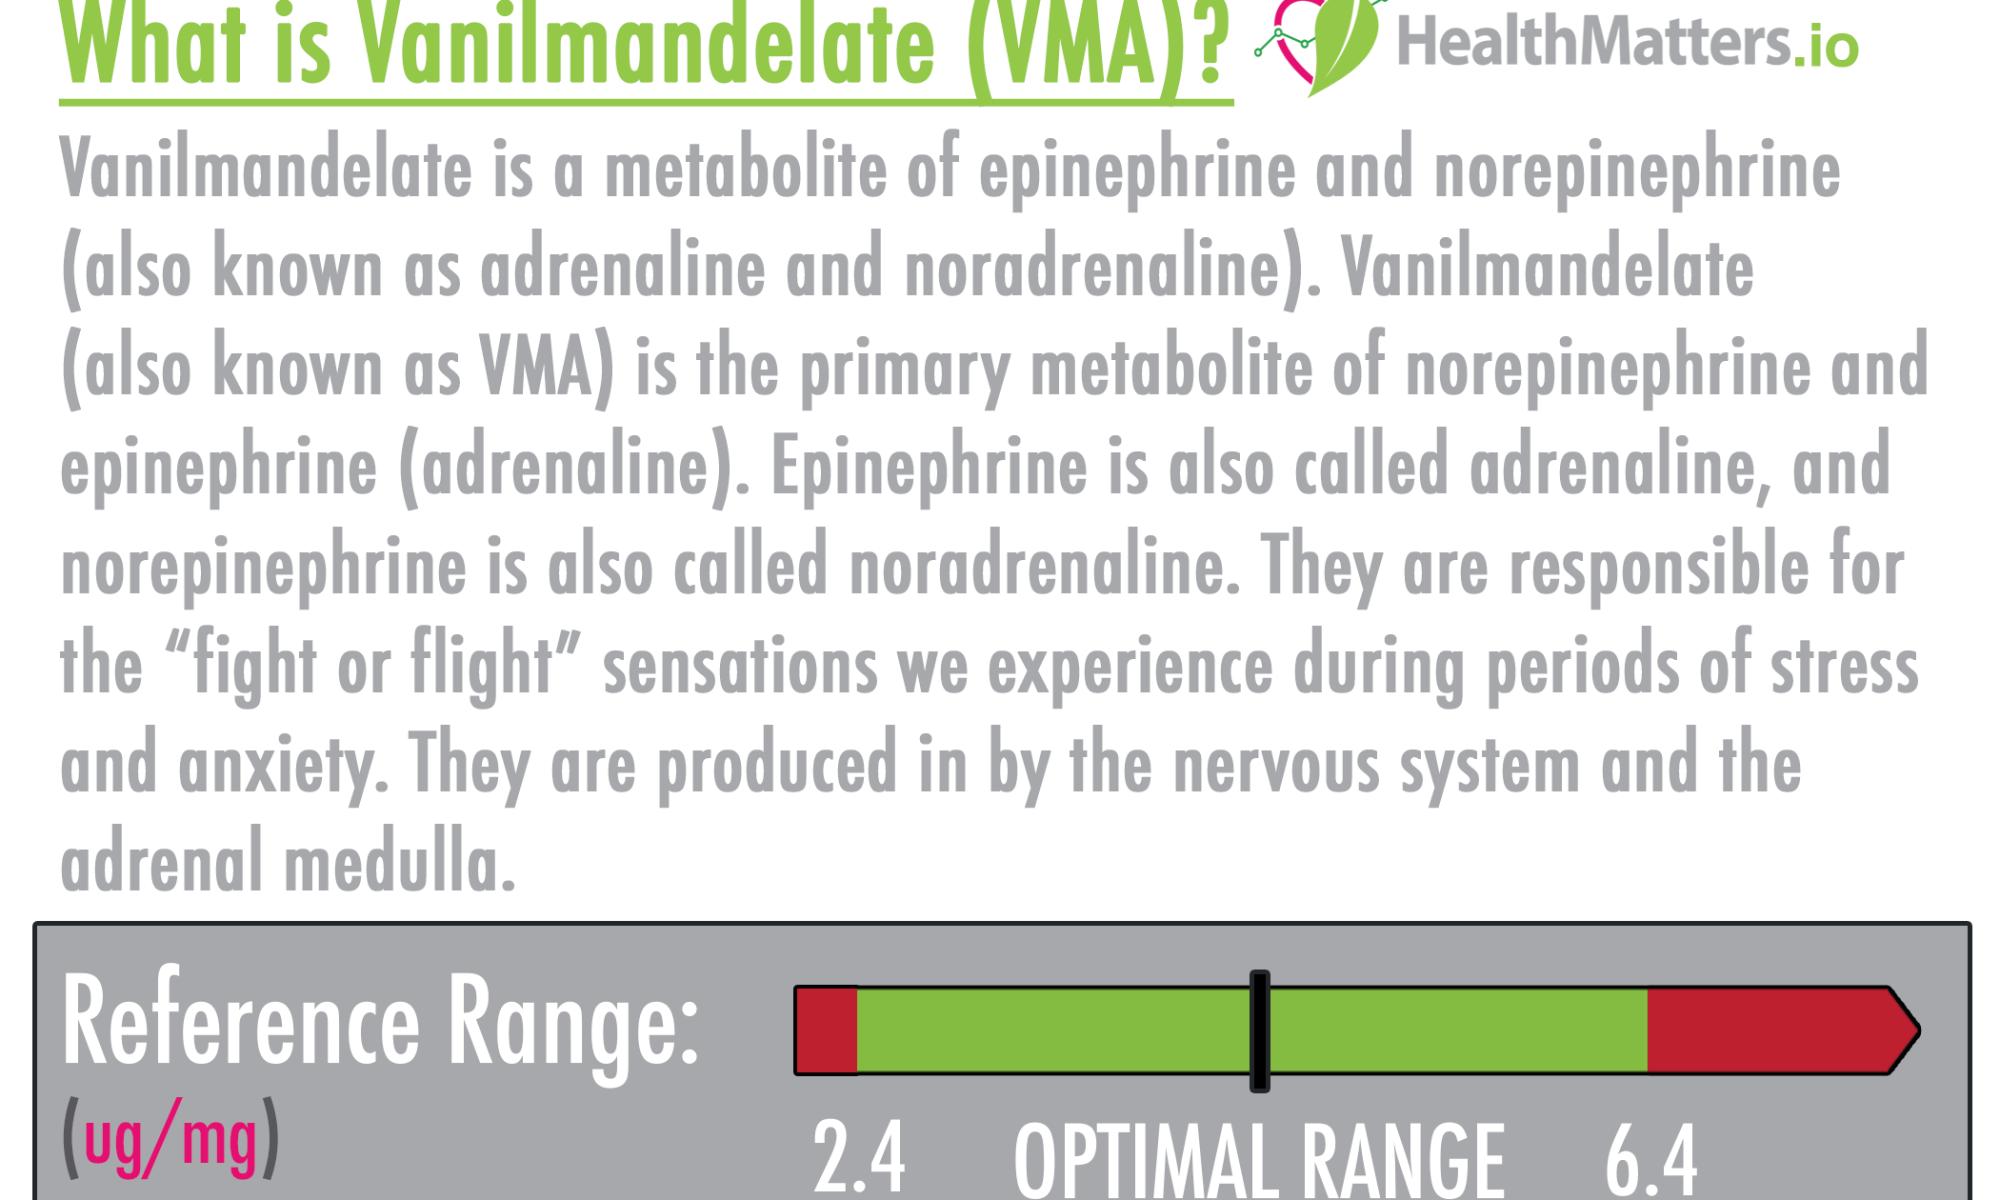 vanilmandelate high low meaning hva vma metabolite epinephrine norepinephrine adrenaline noradrenaline dutch dried urine functional